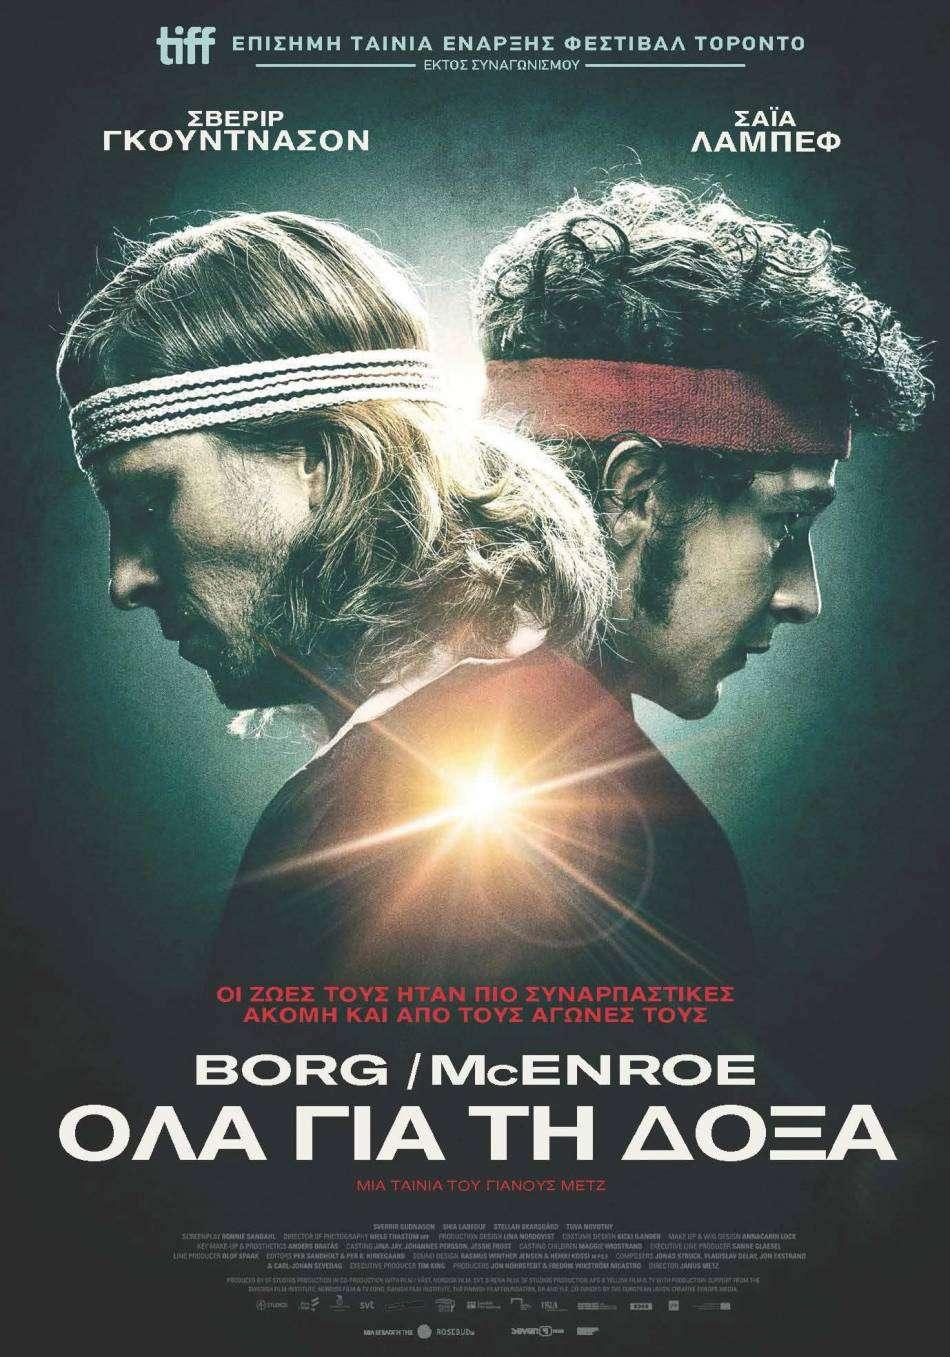 Borg vs McEnroe Όλα για τη Δόξα (Borg vs McEnroe) Poster Πόστερ